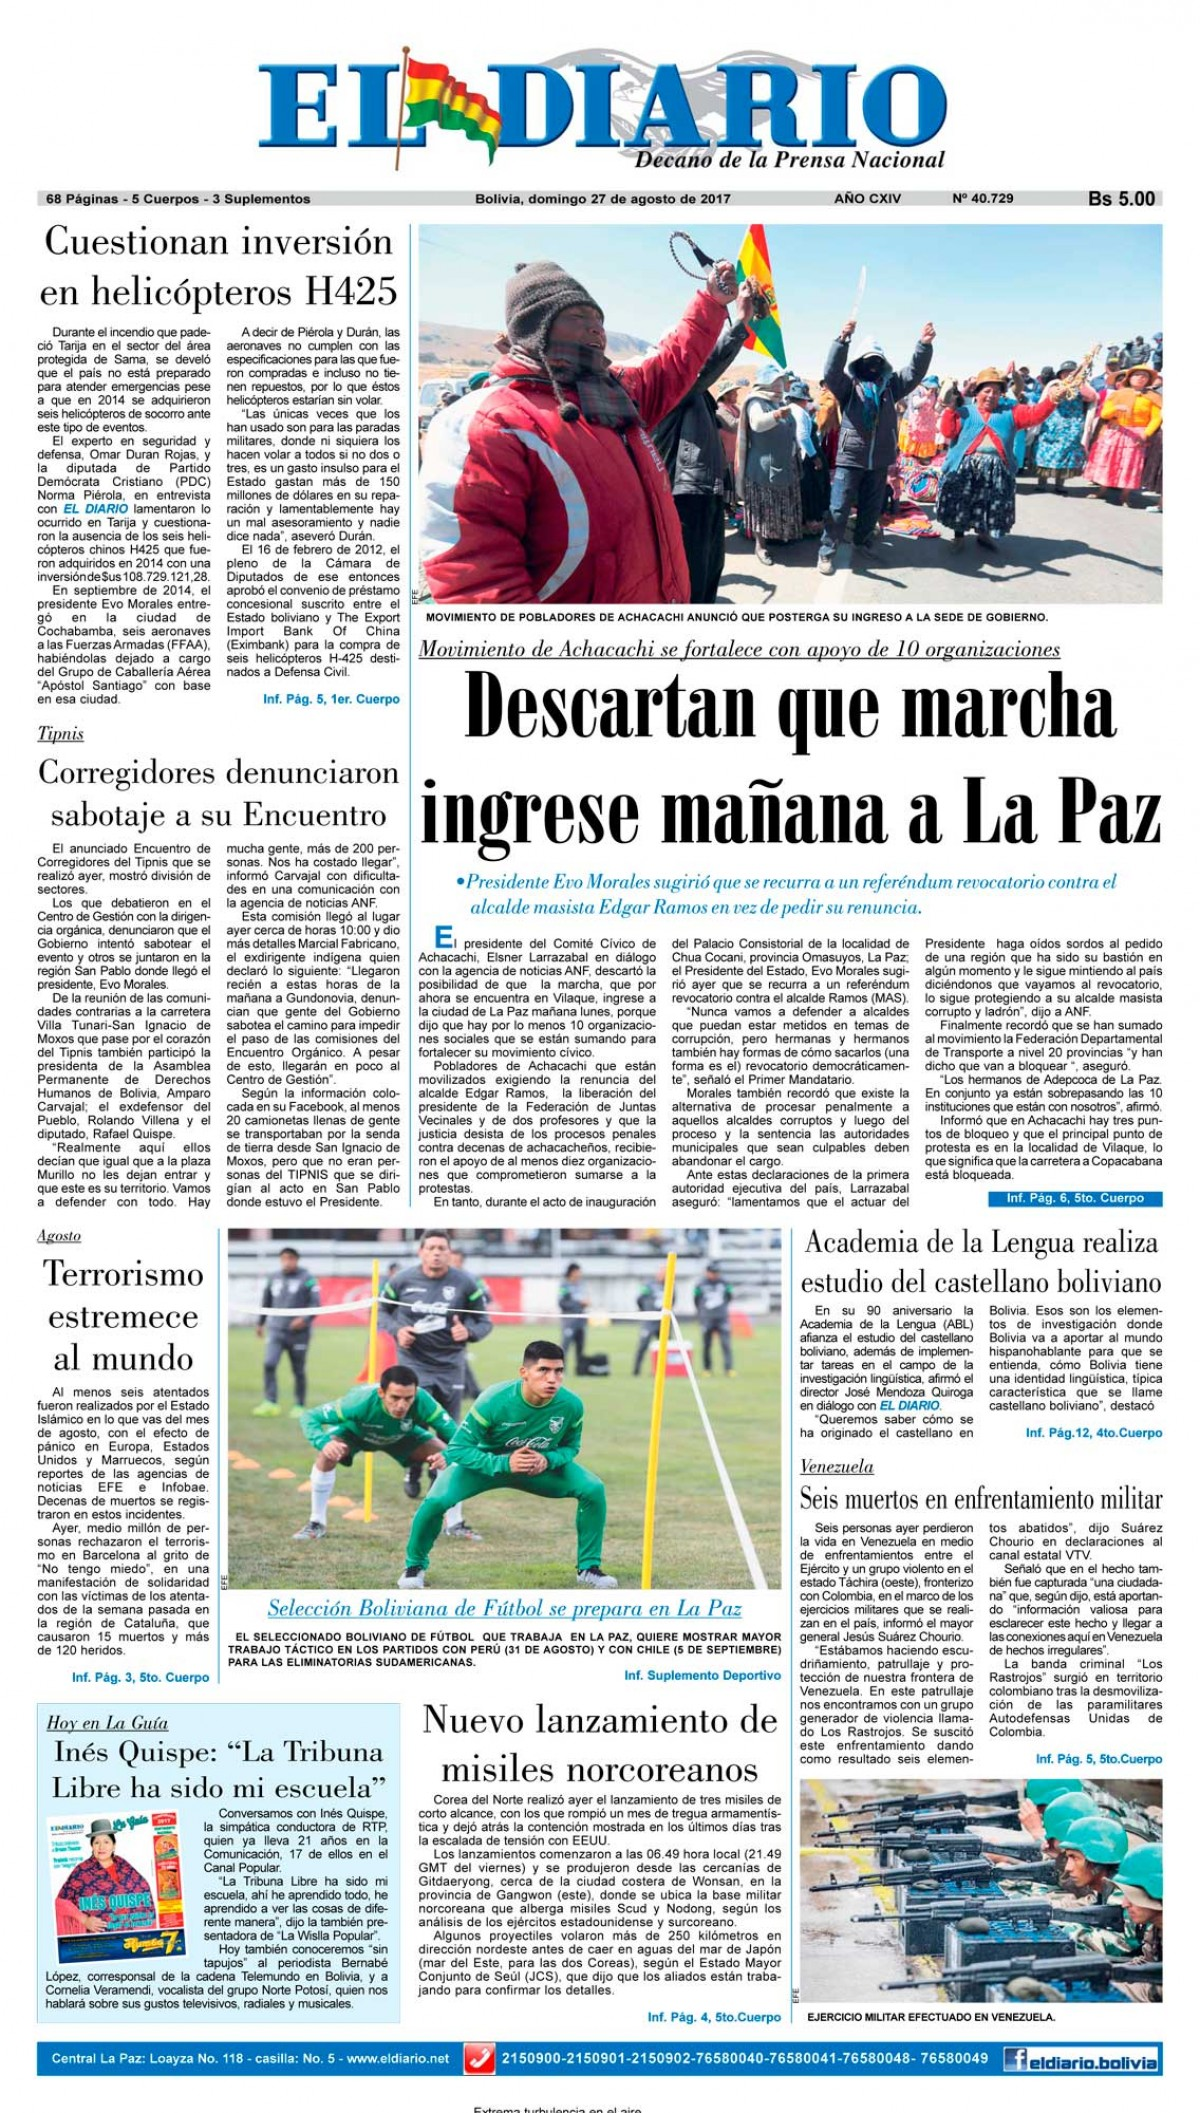 eldiario.net59a2b0d4e2201.jpg